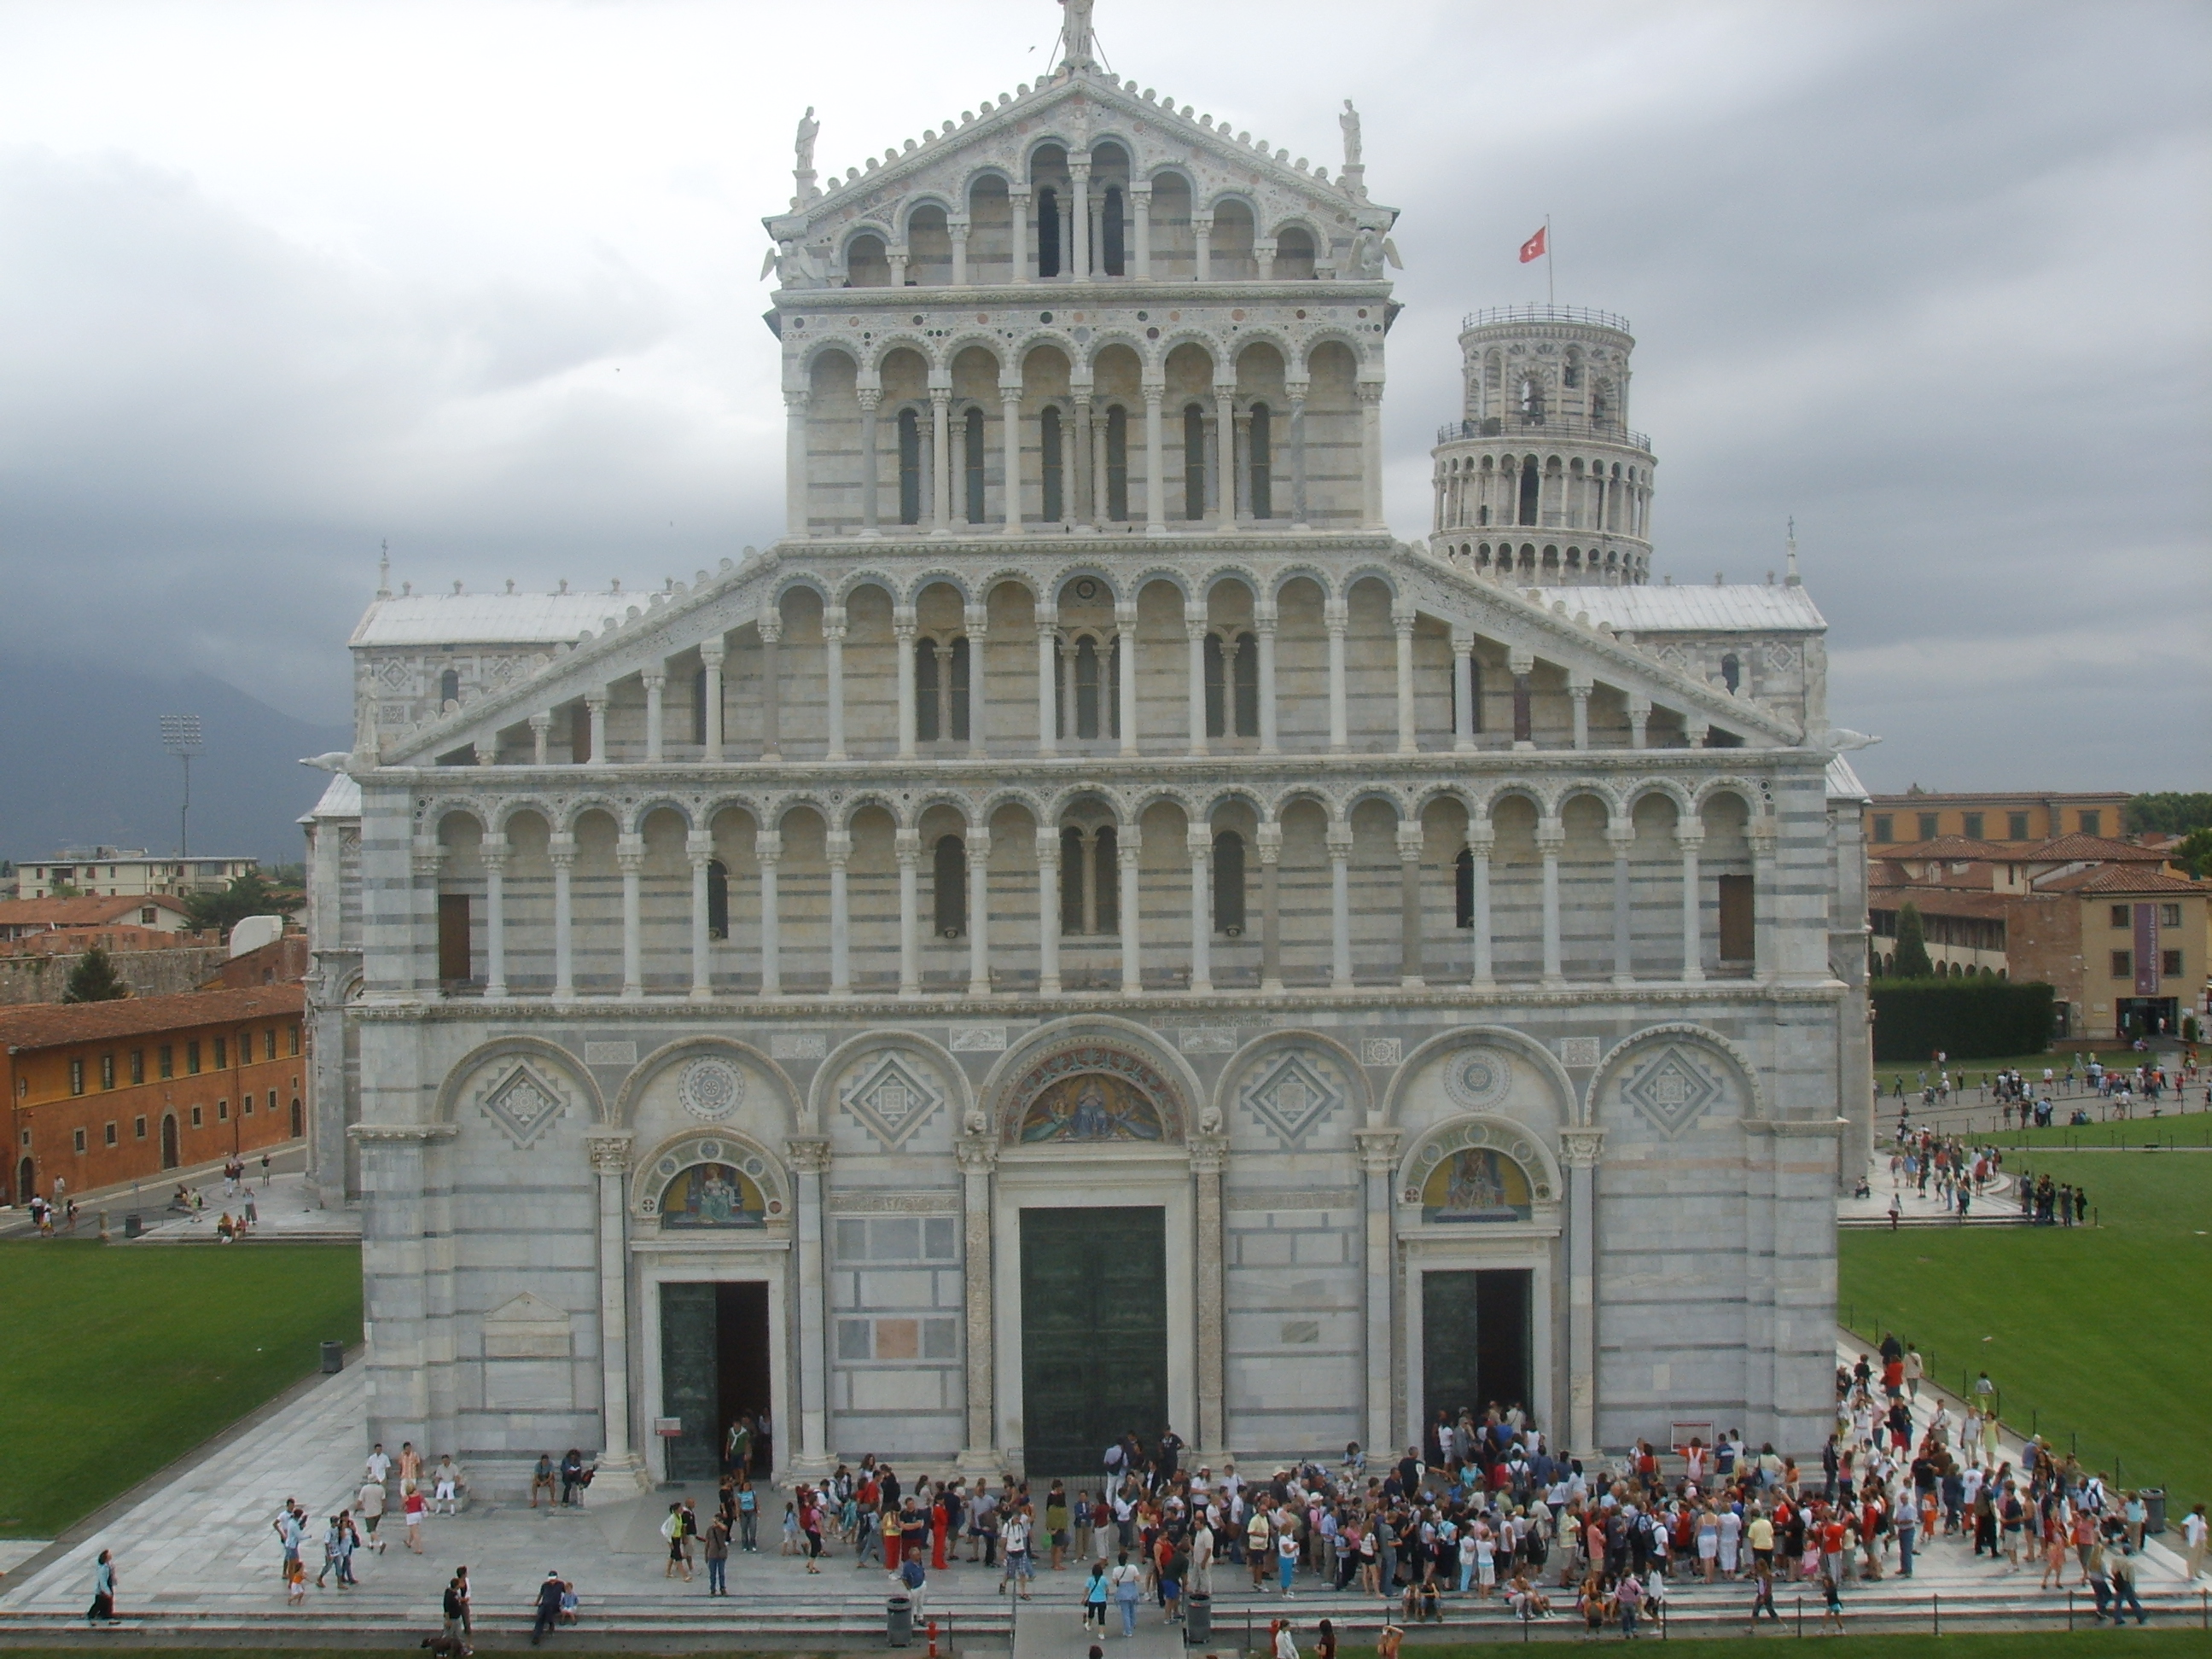 http://upload.wikimedia.org/wikipedia/commons/2/27/Duomo_di_Pisa,_facciata.JPG